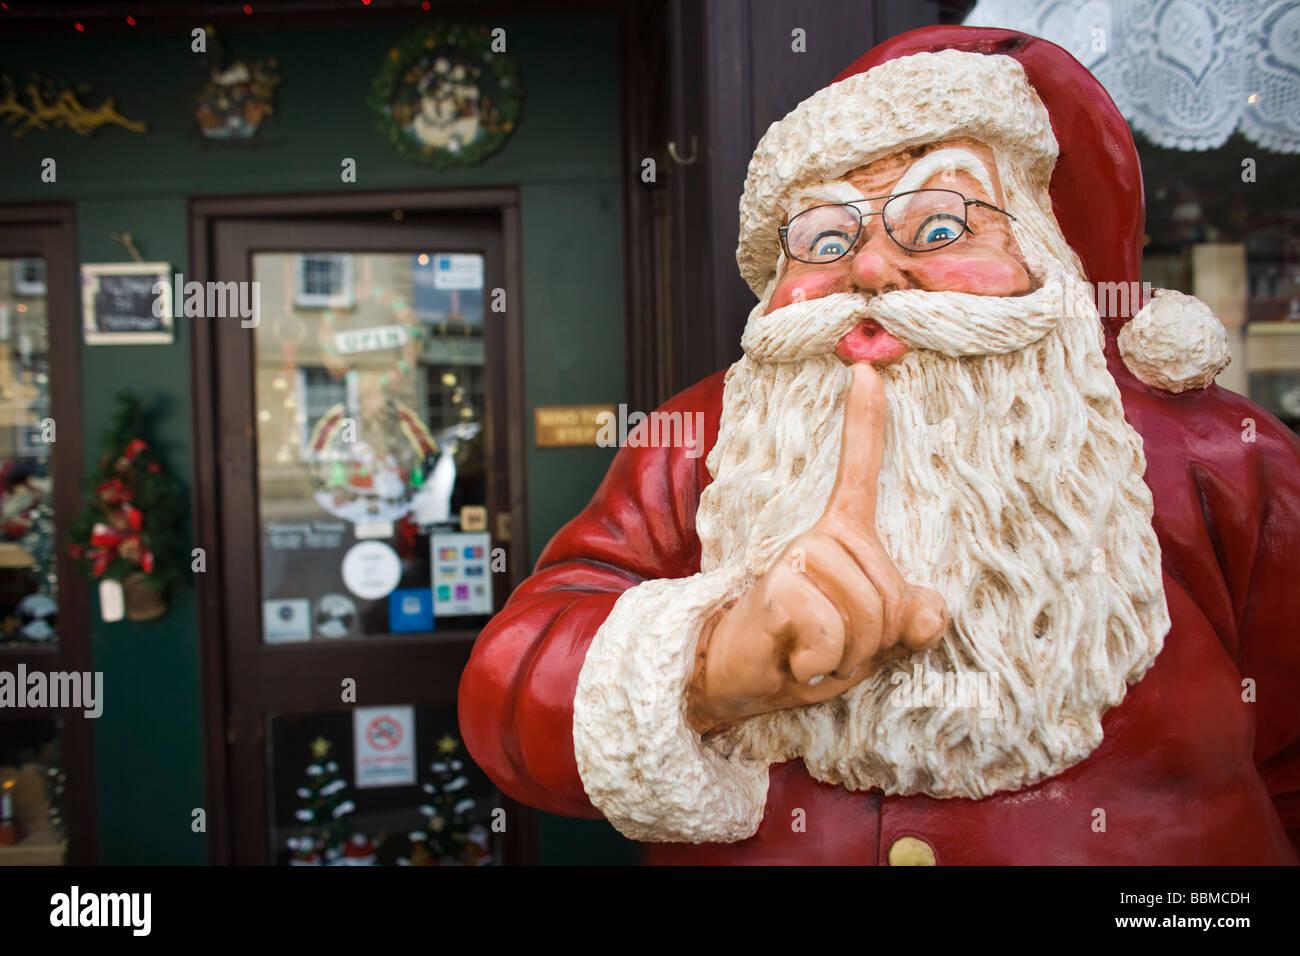 Christmas Shop Santa Claus Statue Stockfotos & Christmas Shop Santa ...